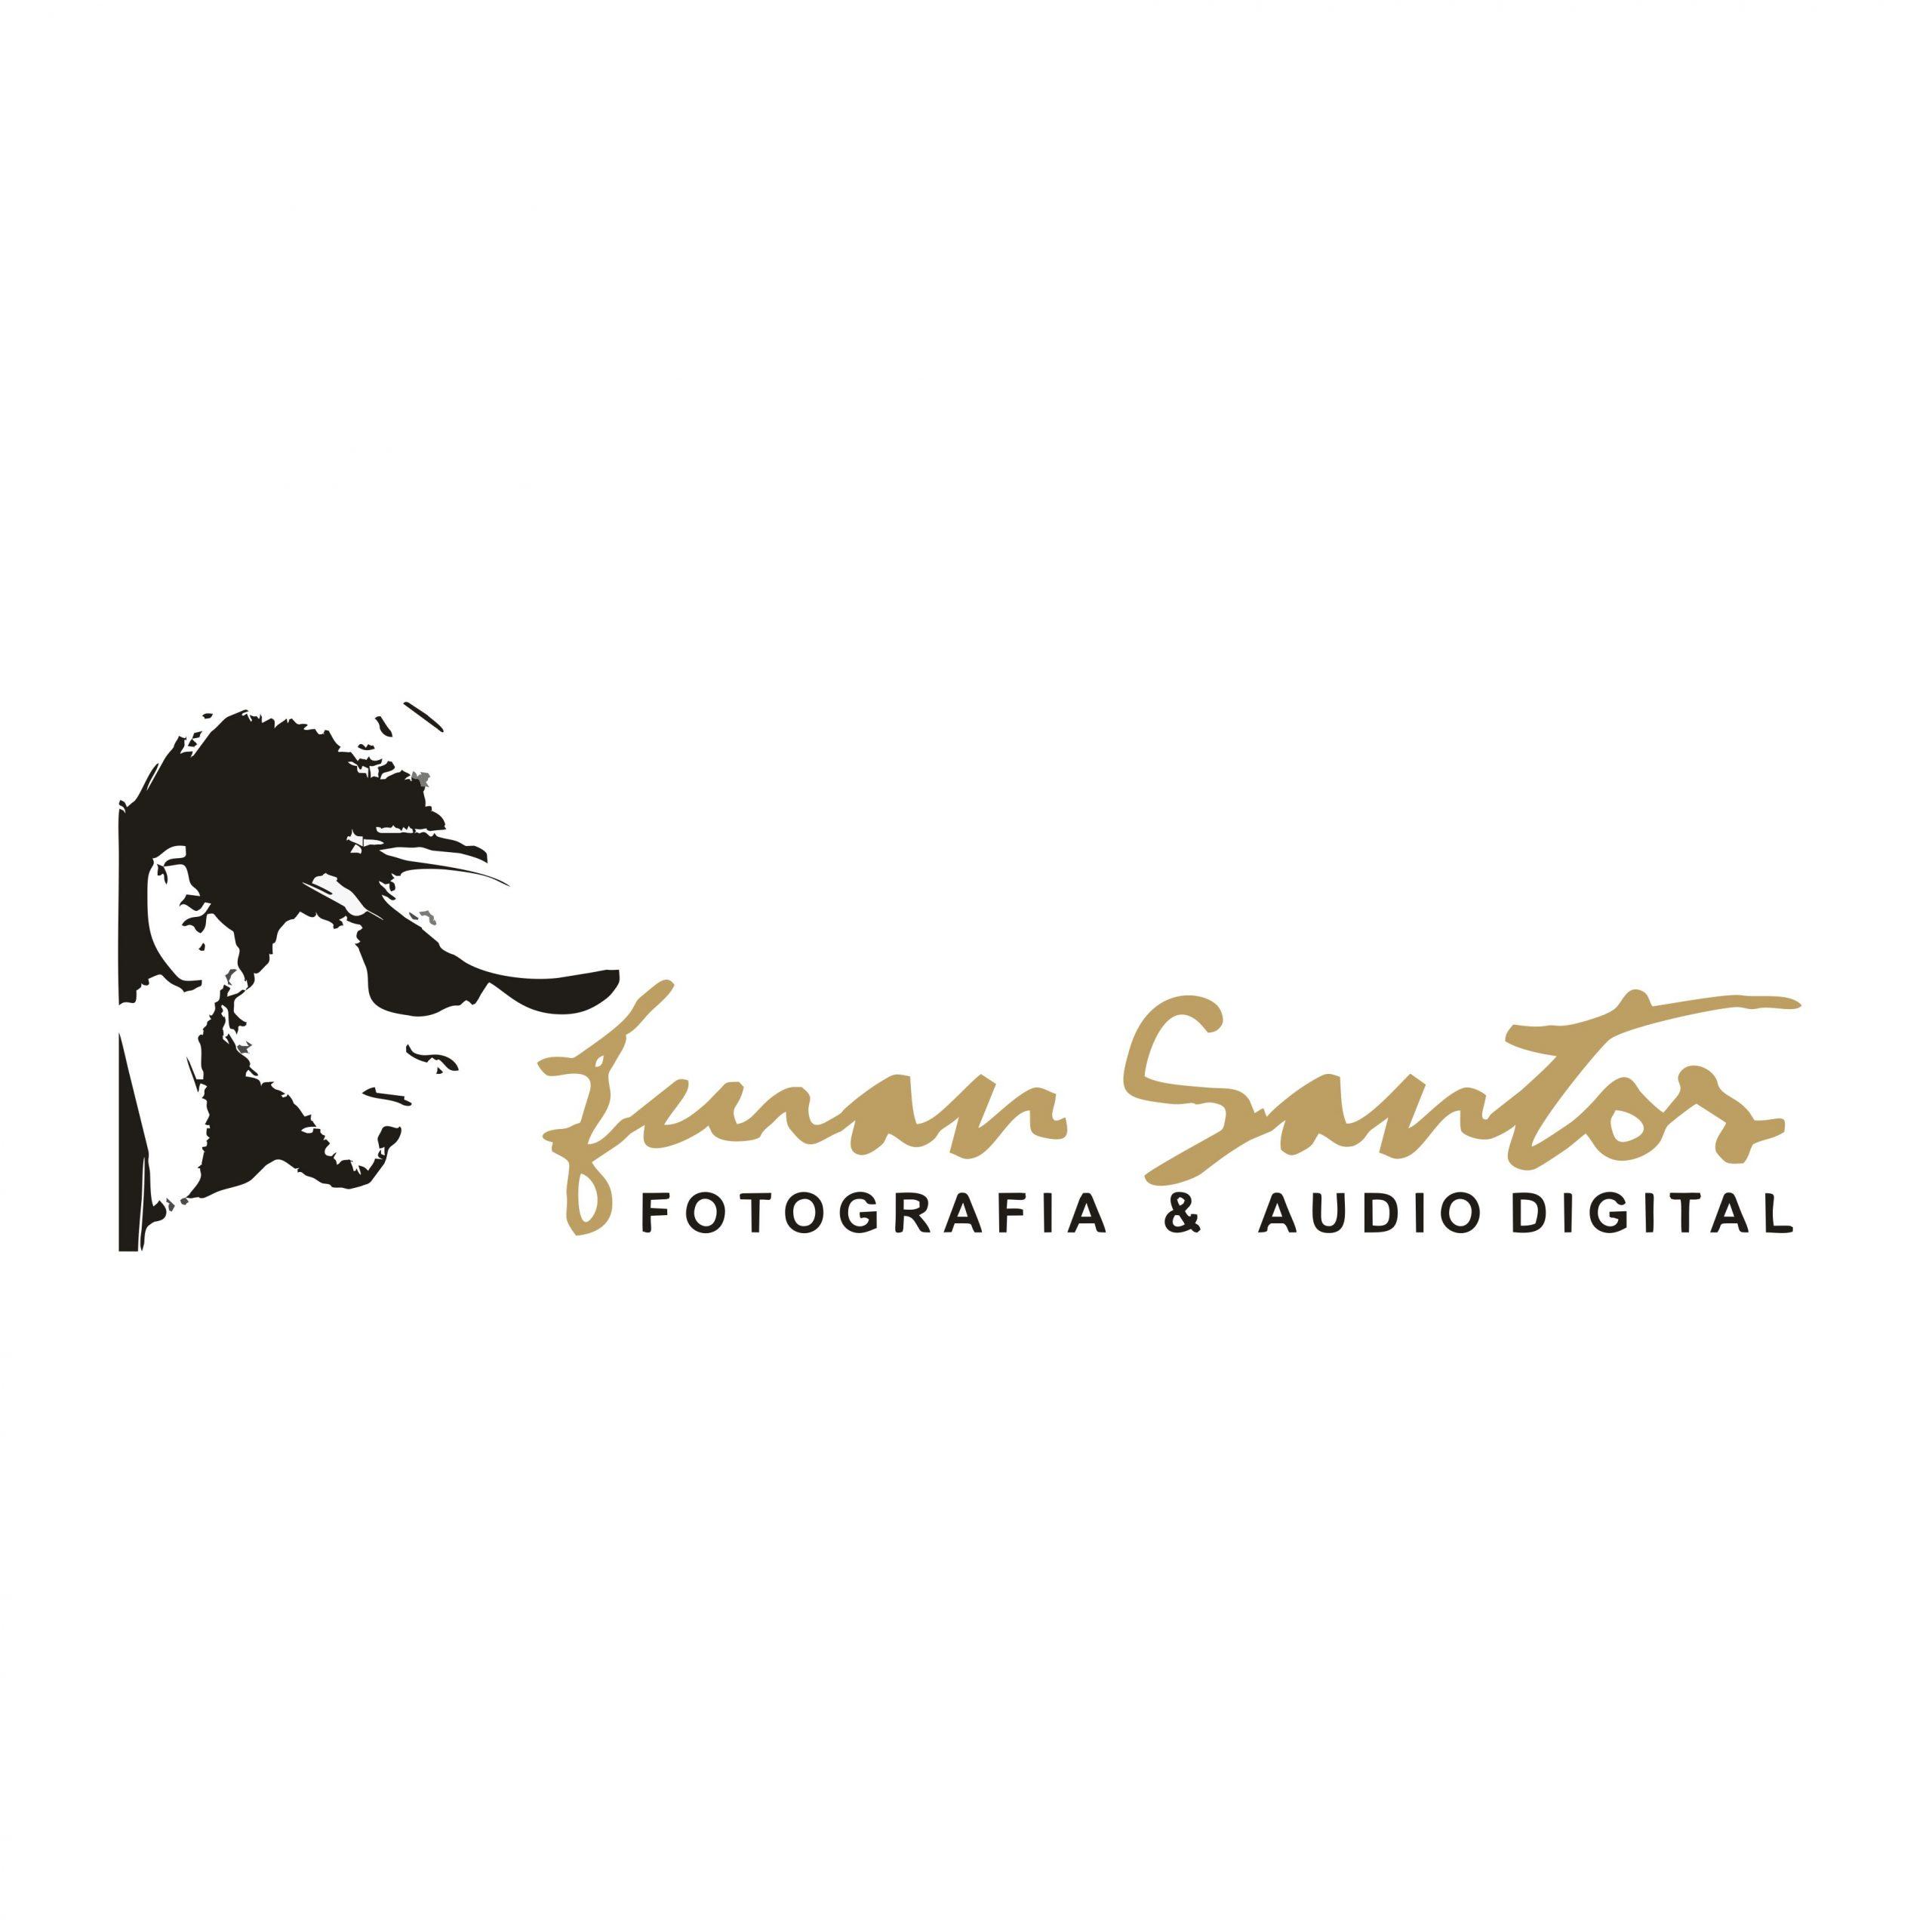 Juran Santos